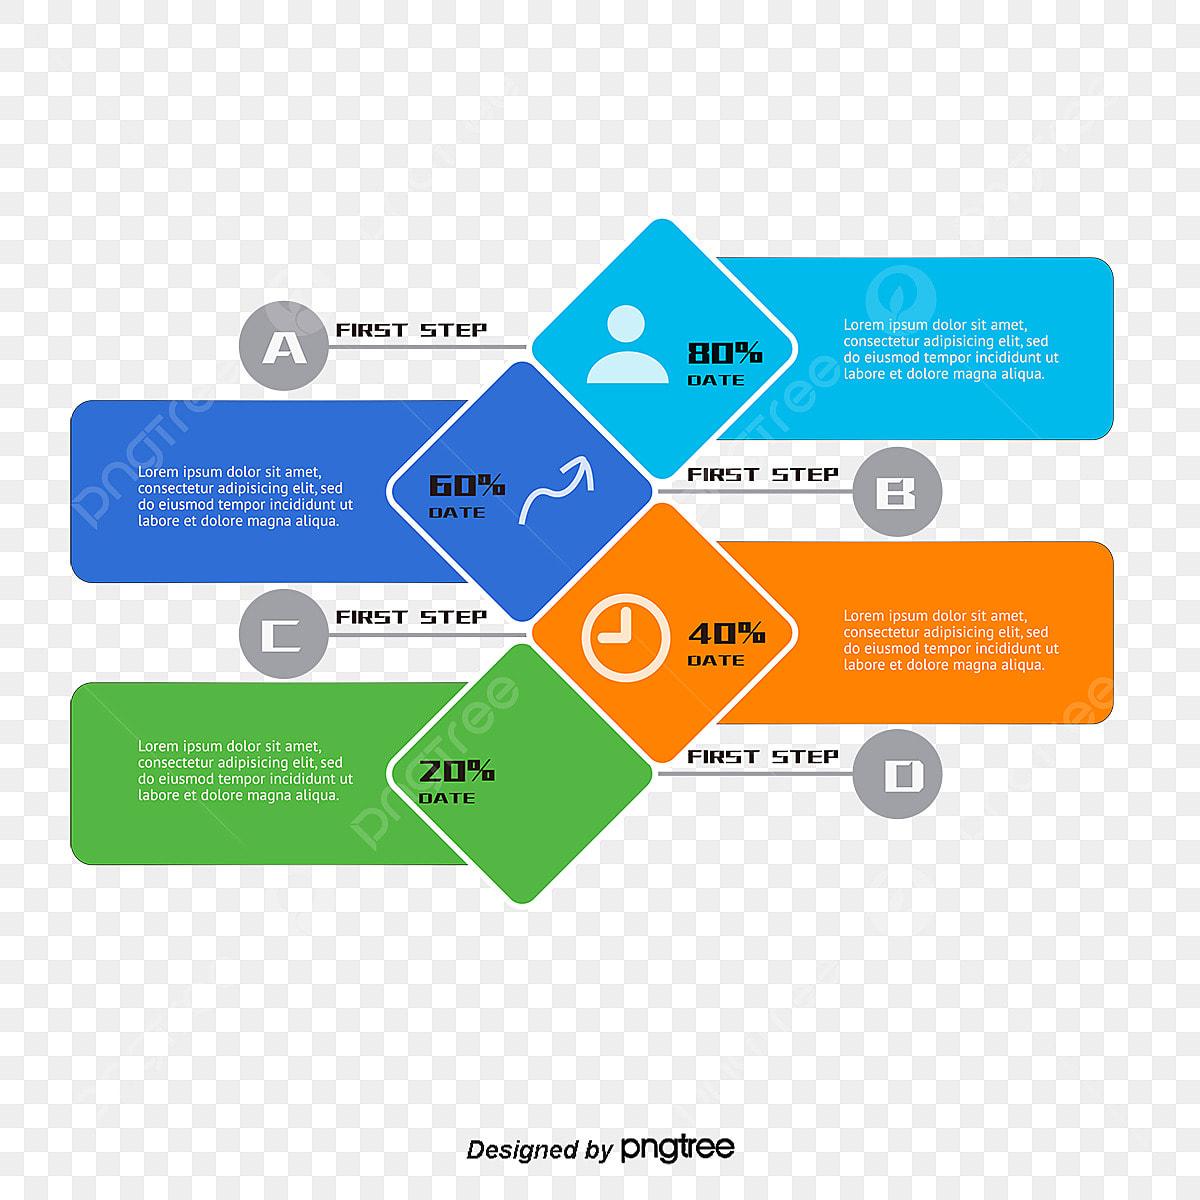 Ppt Ladder Diagram Elements, Vector, Ppt, Ladder PNG and